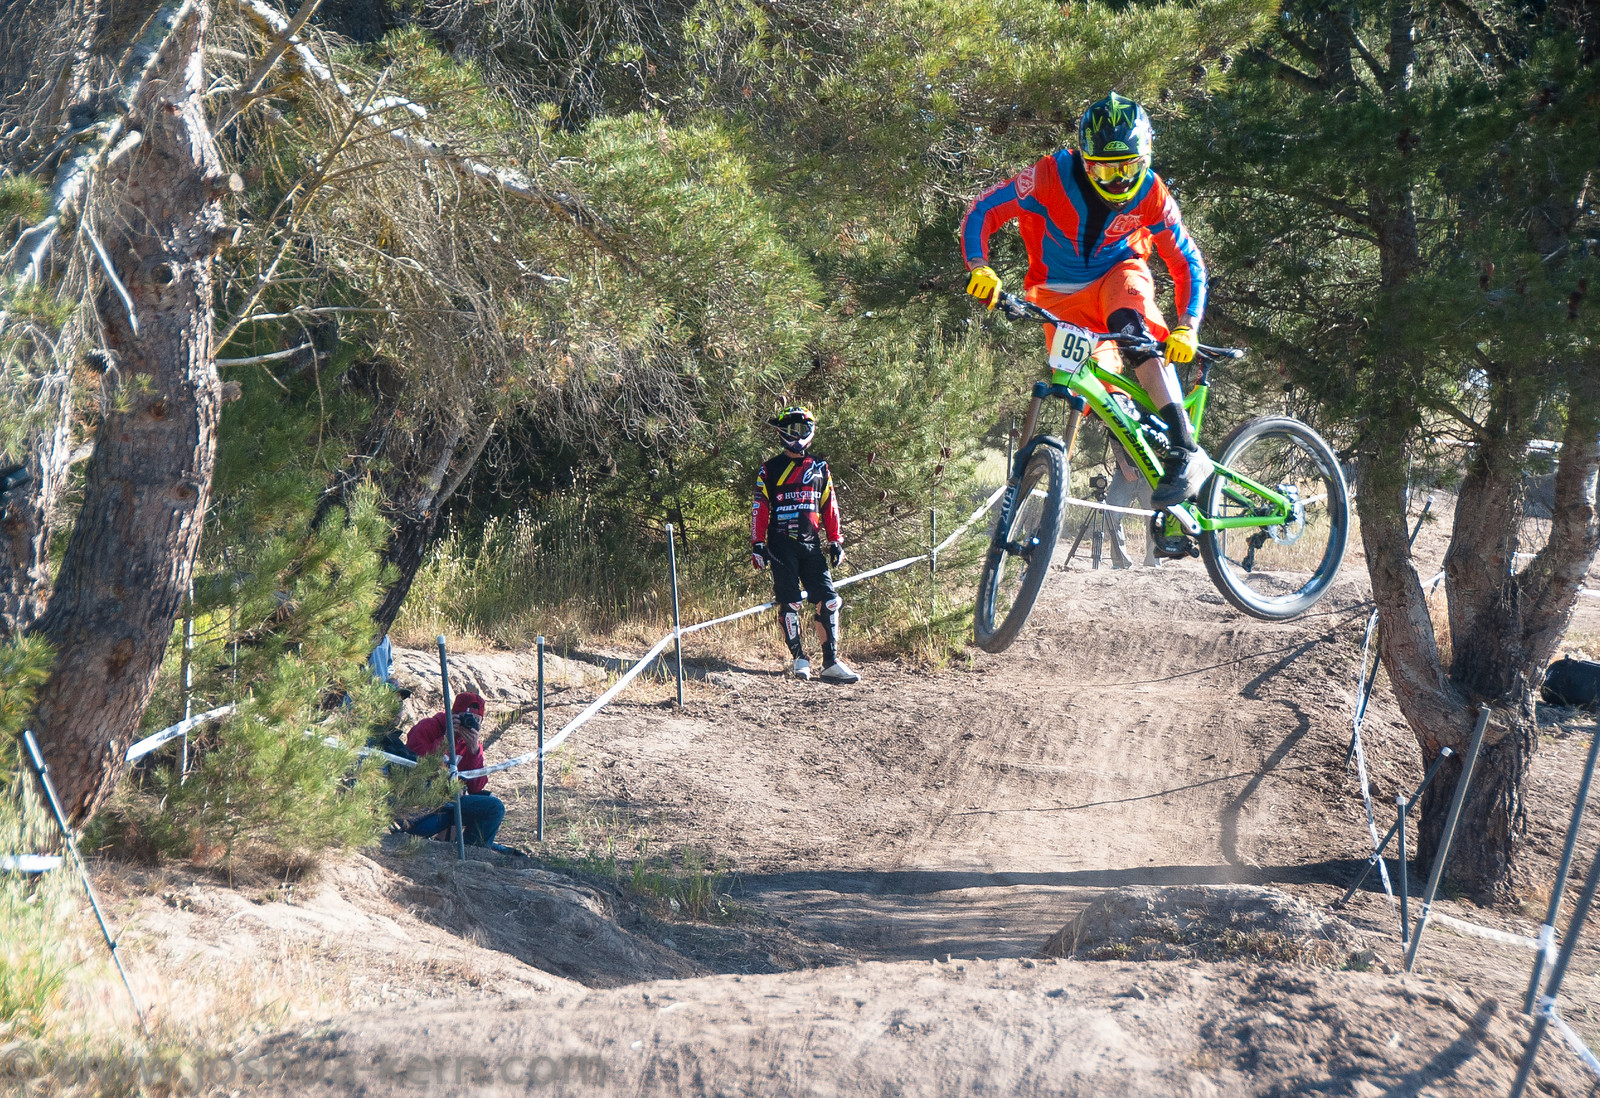 4-19-13DHPractice (3 of 36) - jkern620 - Mountain Biking Pictures - Vital MTB